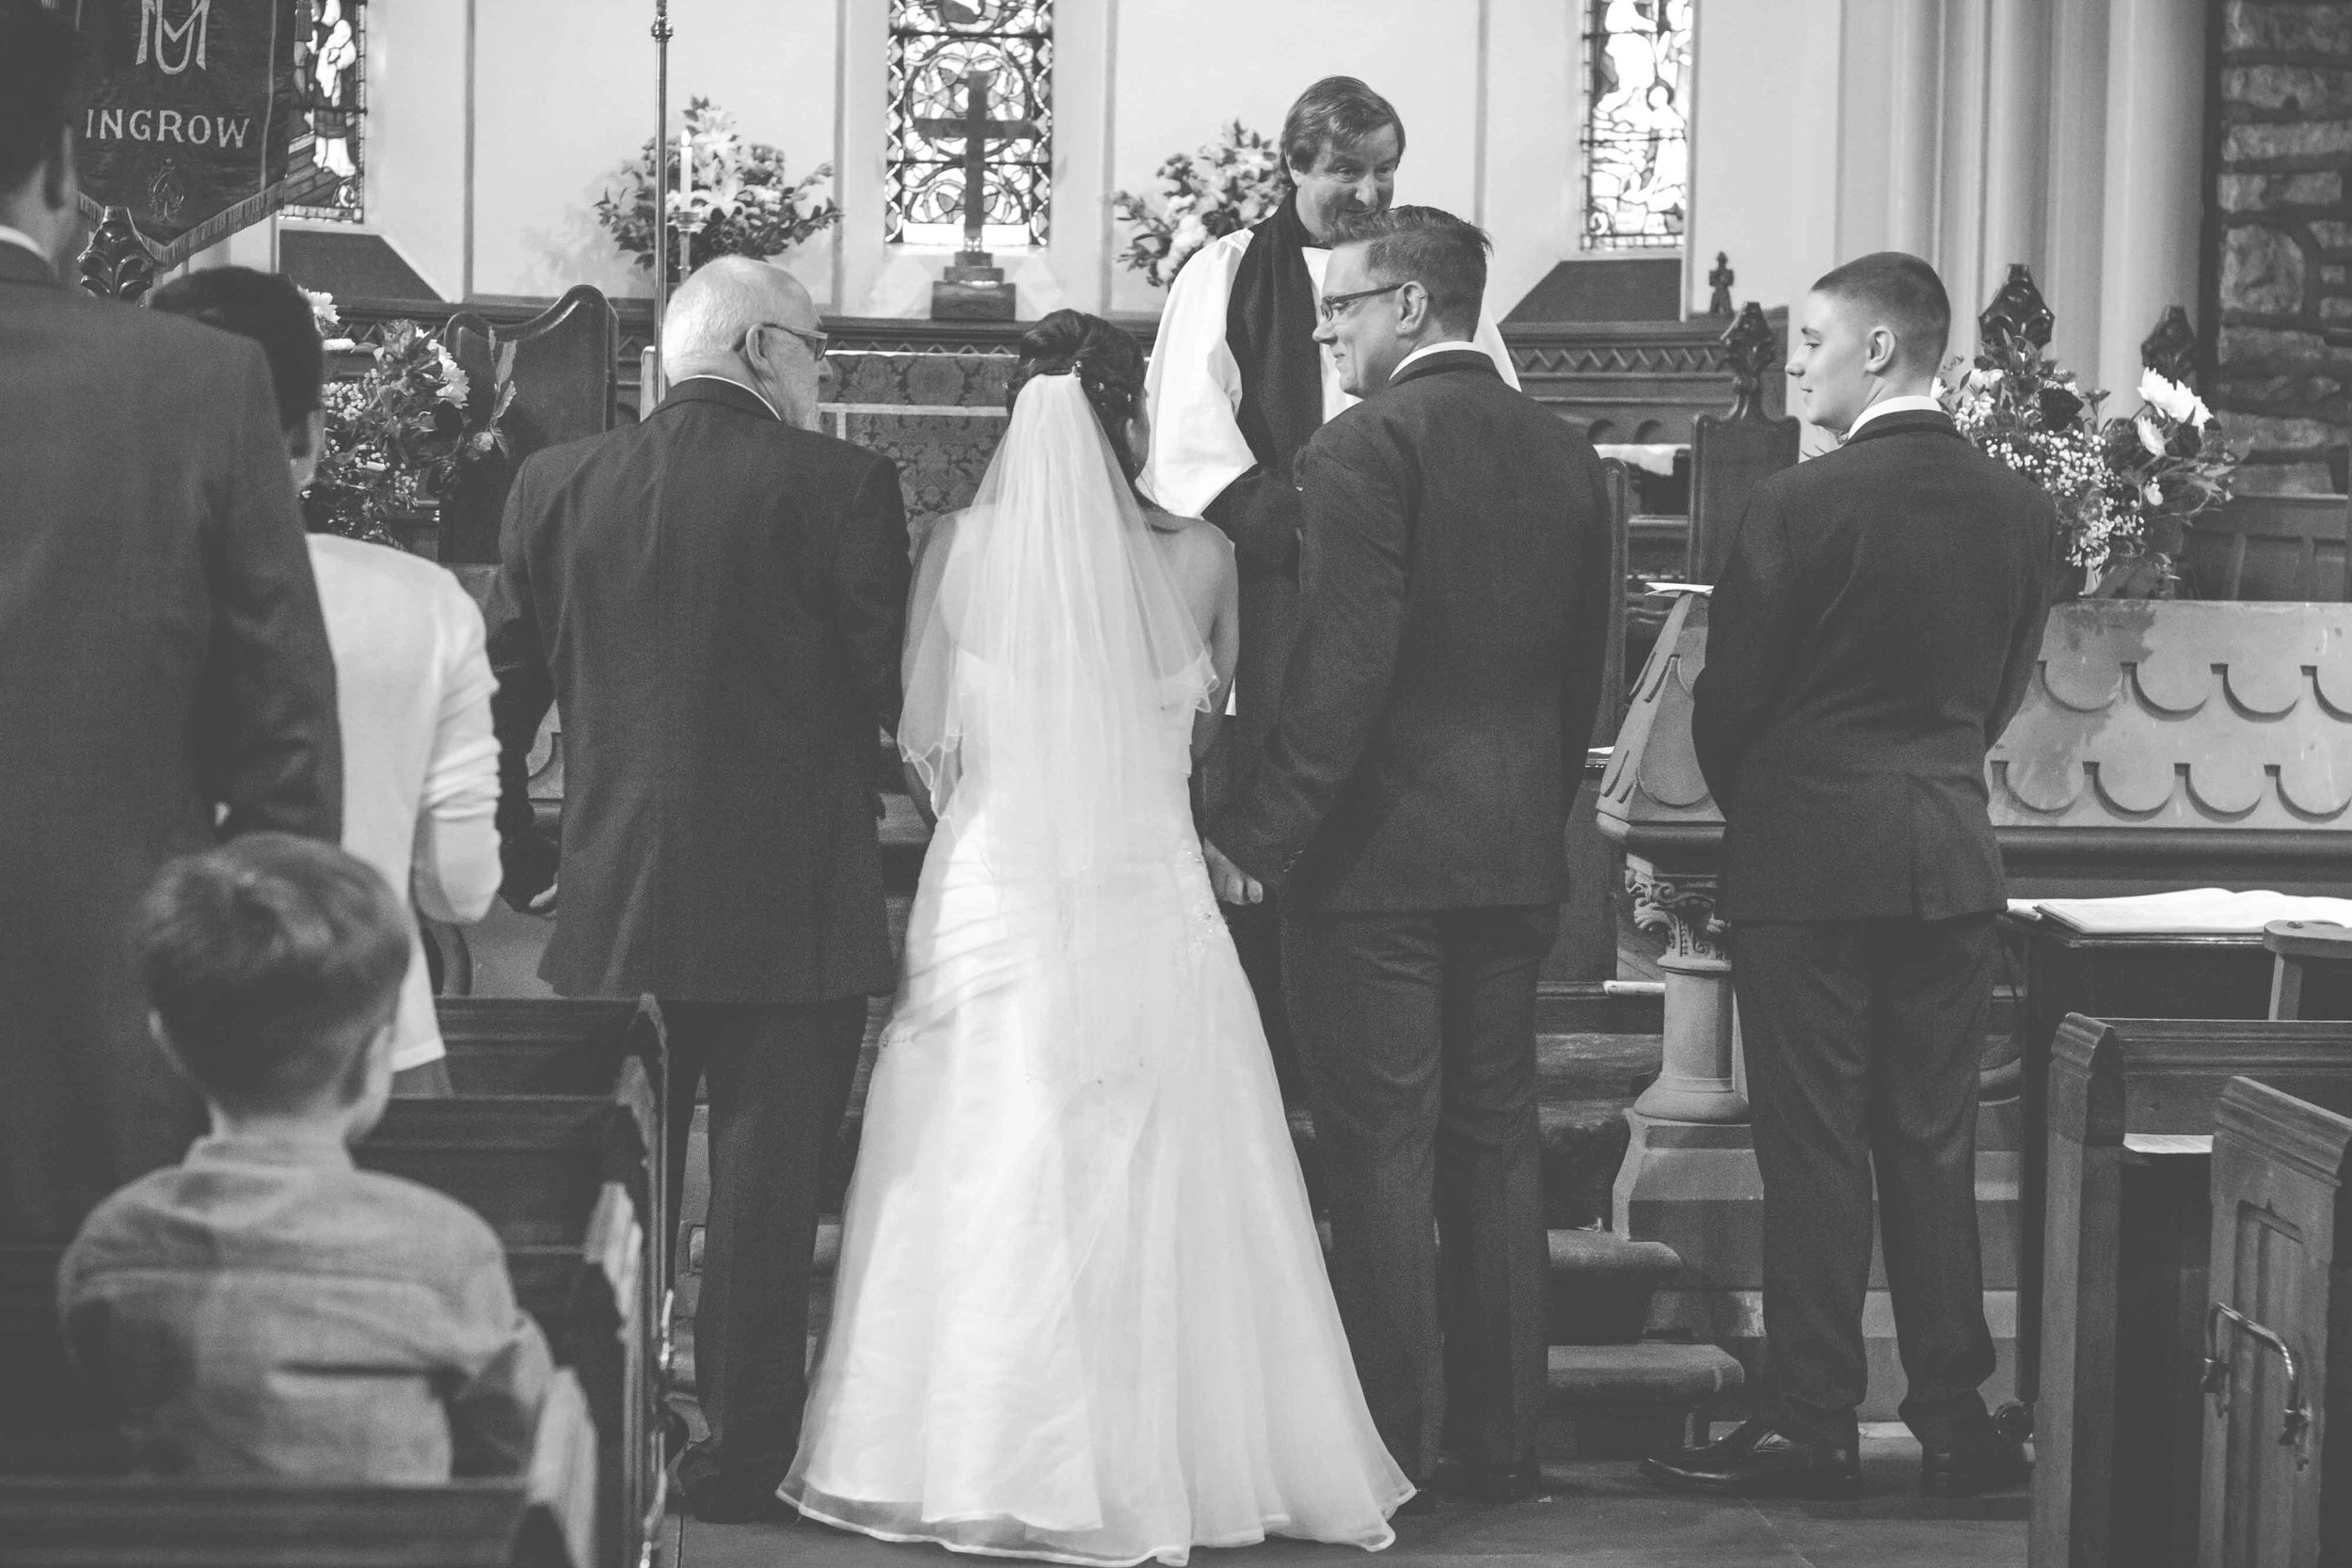 st-johns-ingrow-wedding-photographer-21.jpg